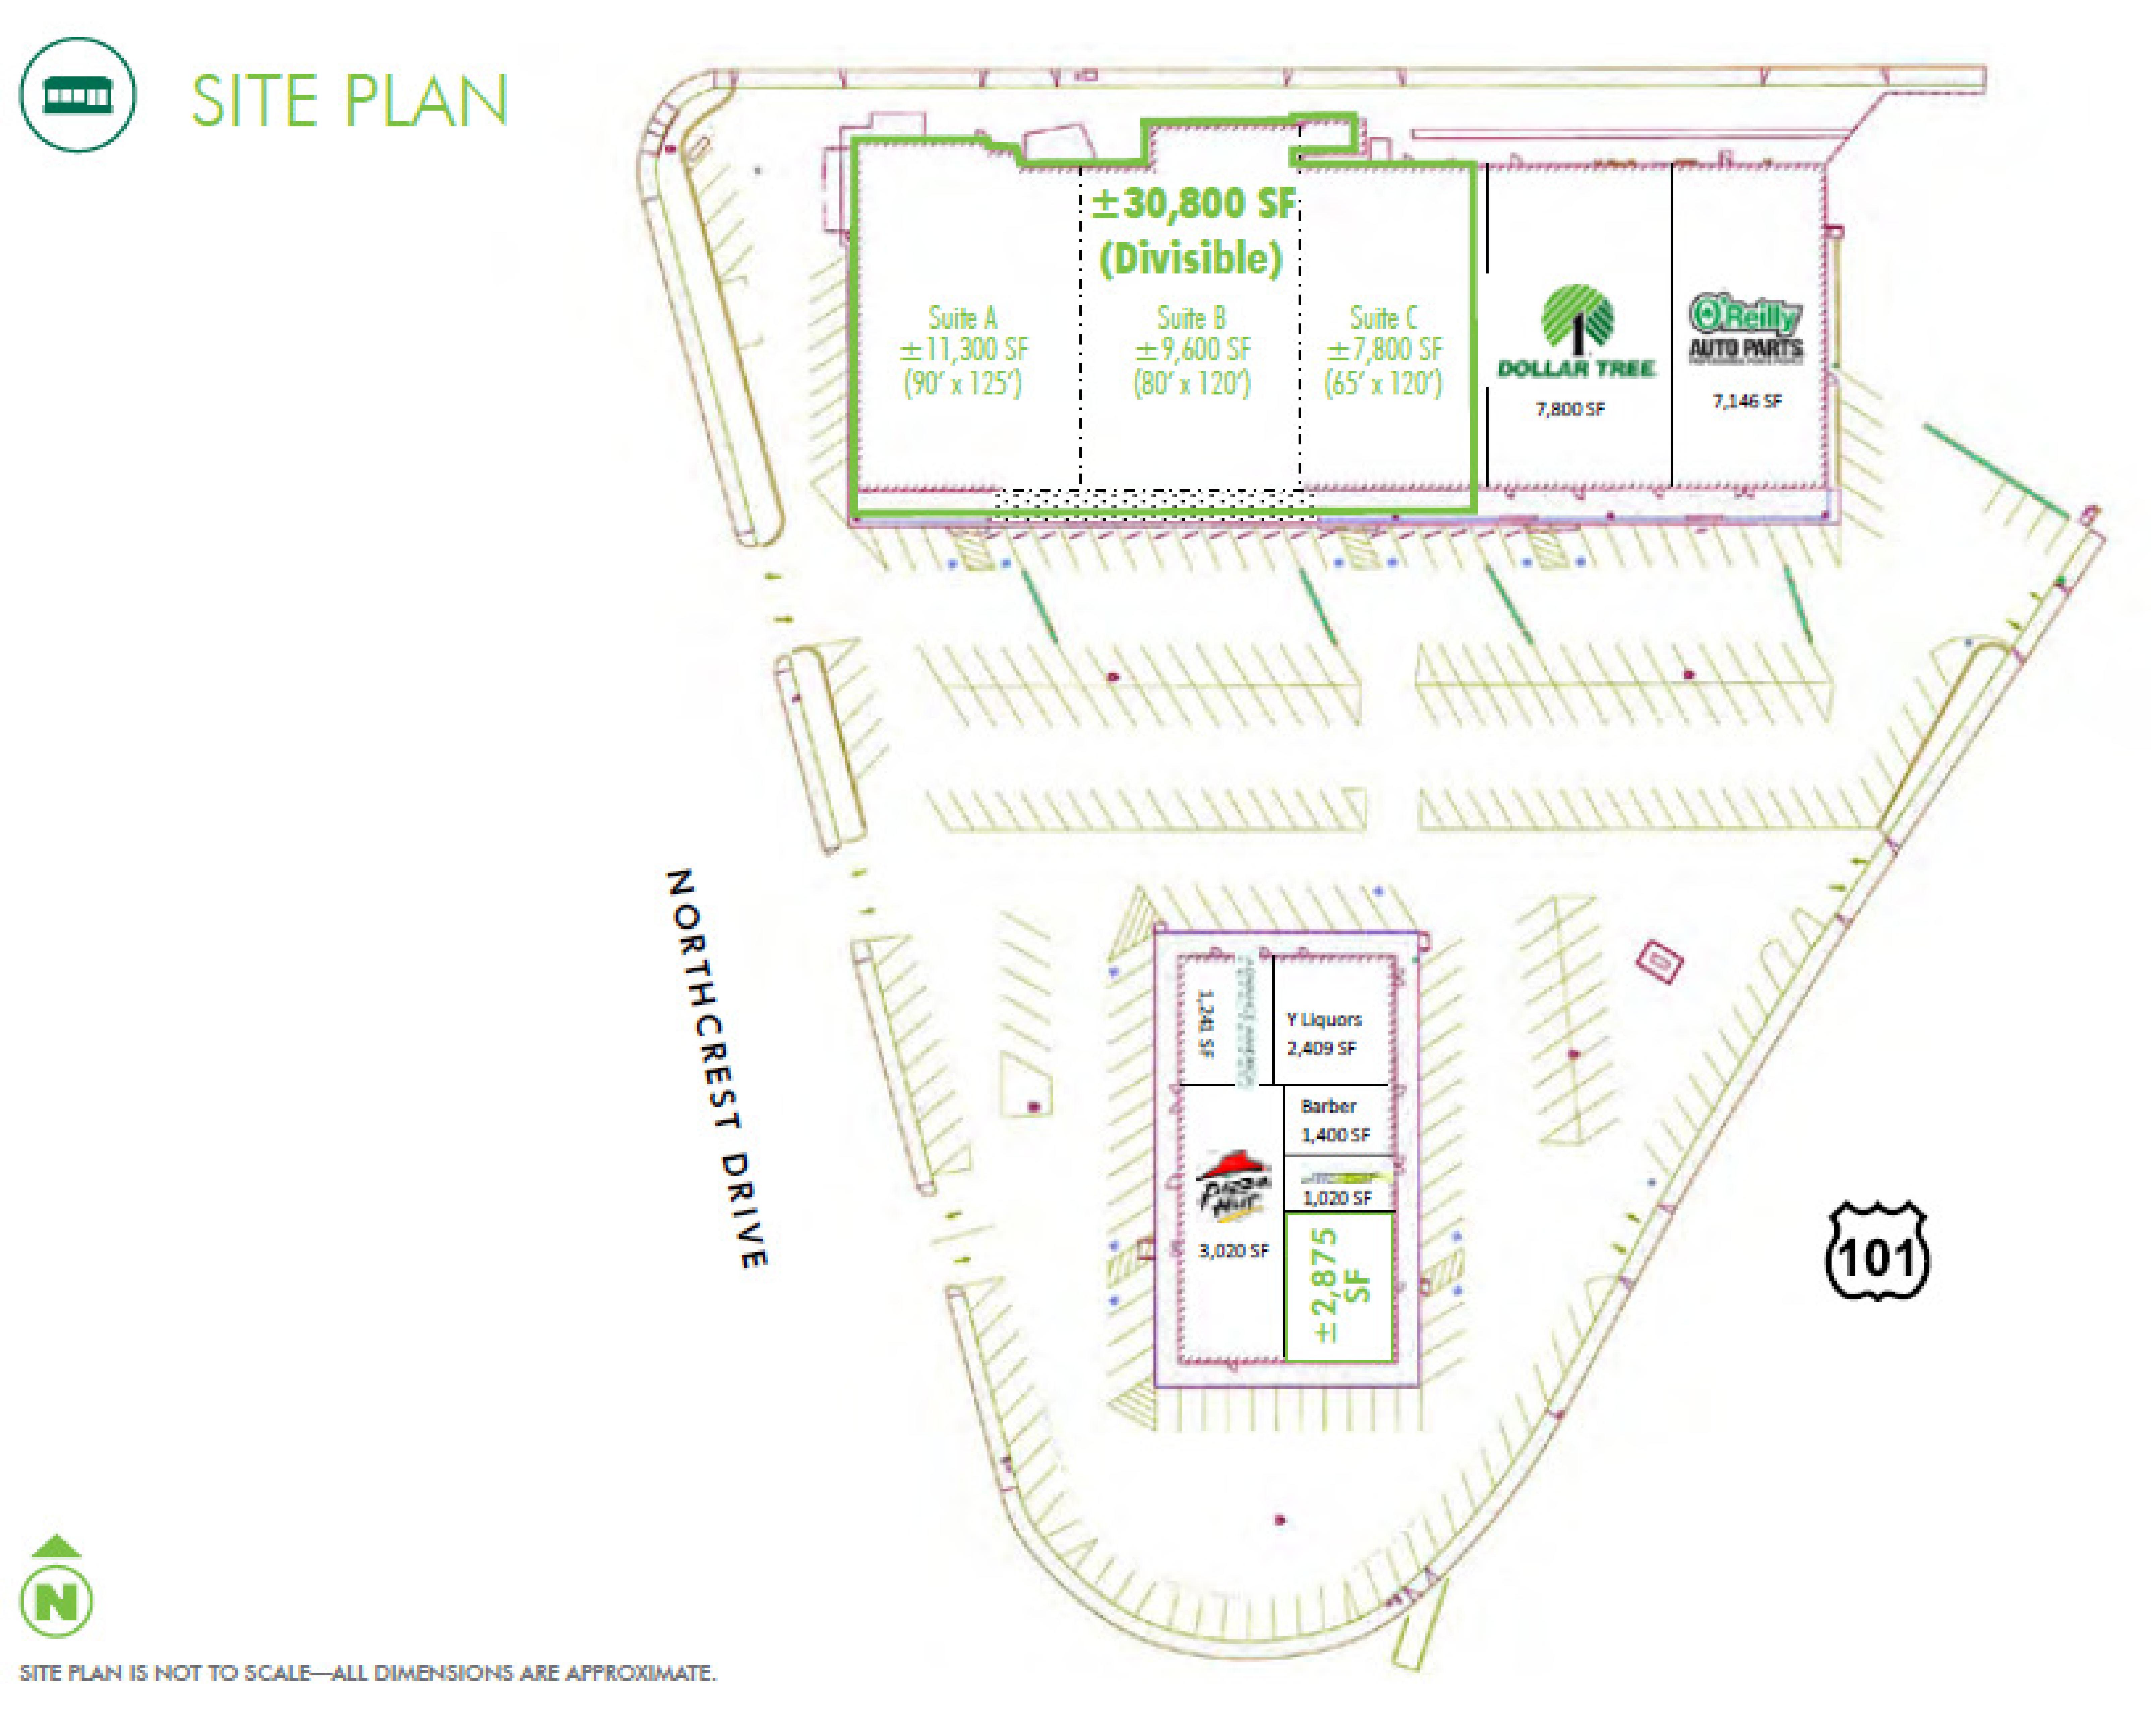 Crescent City Shopping Center: site plan